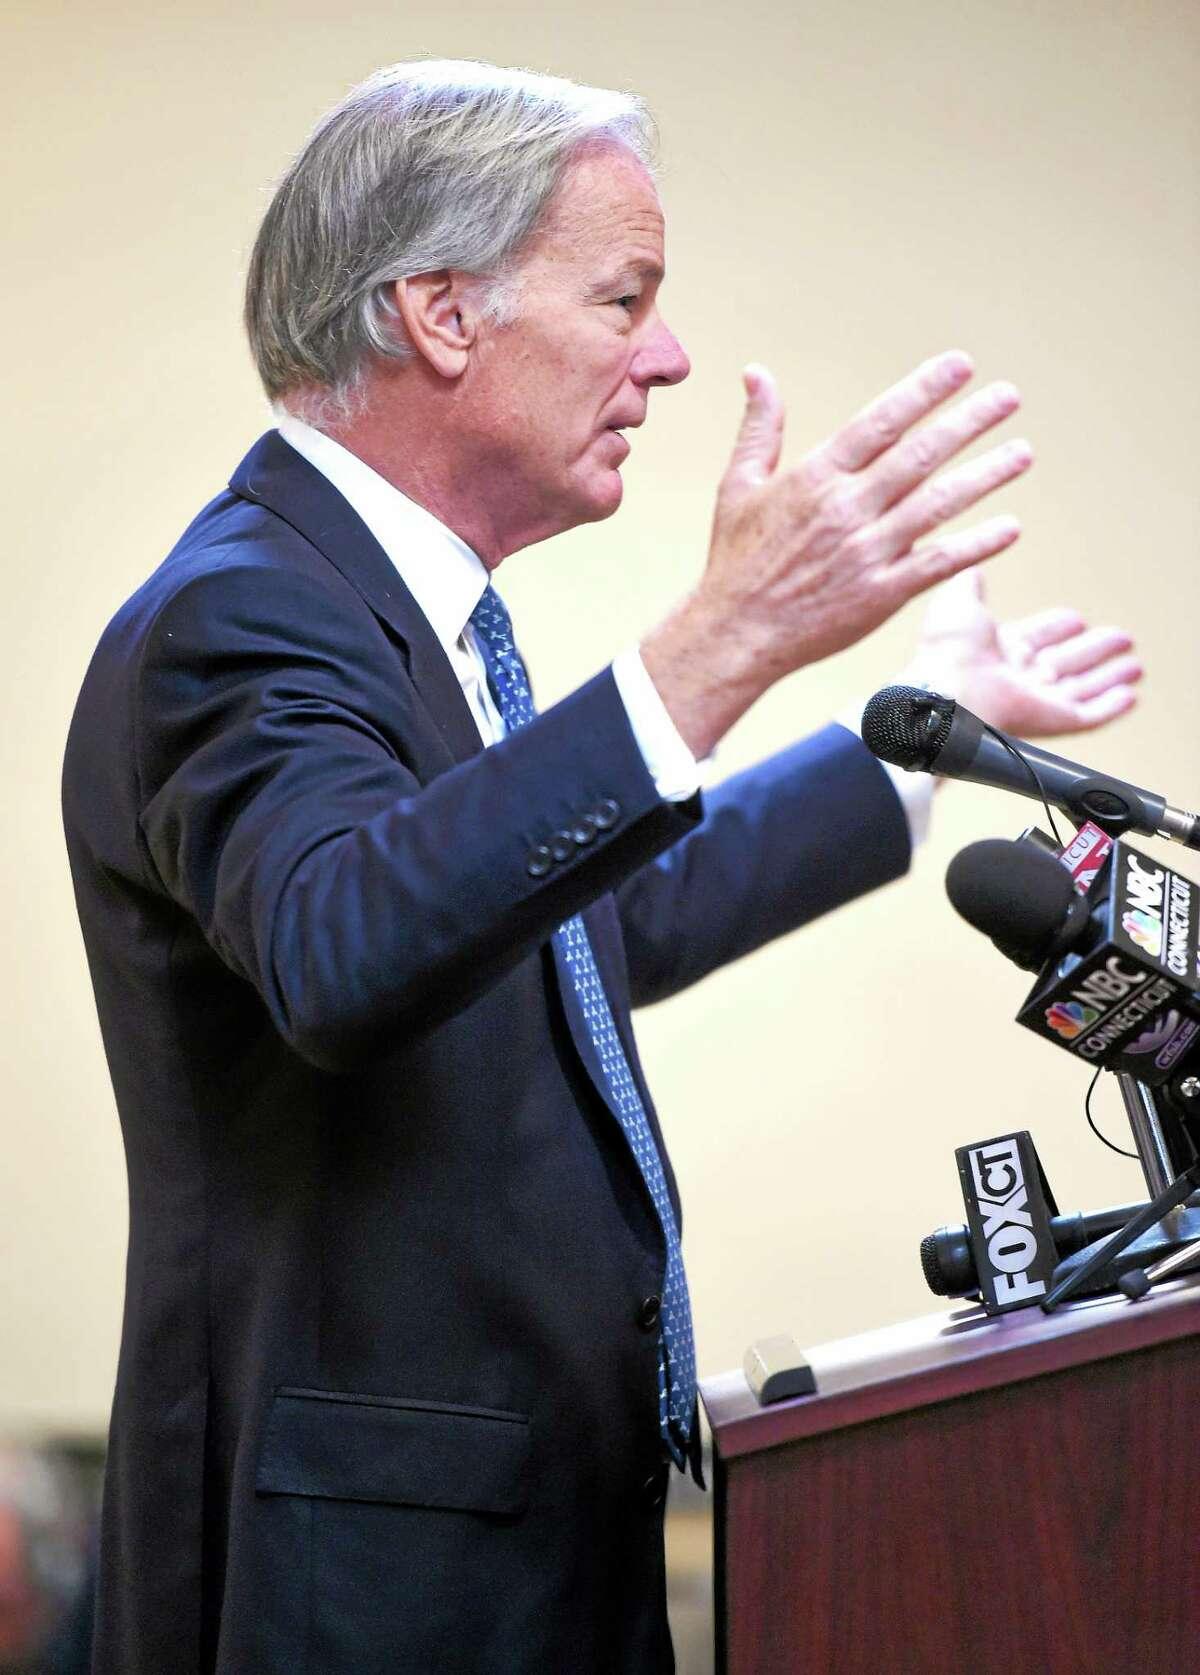 (Arnold Gold-New Haven Register) Connecticut gubernatorial candidate Tom Foley speaks at a Transportation Forum in North Haven on Monday.